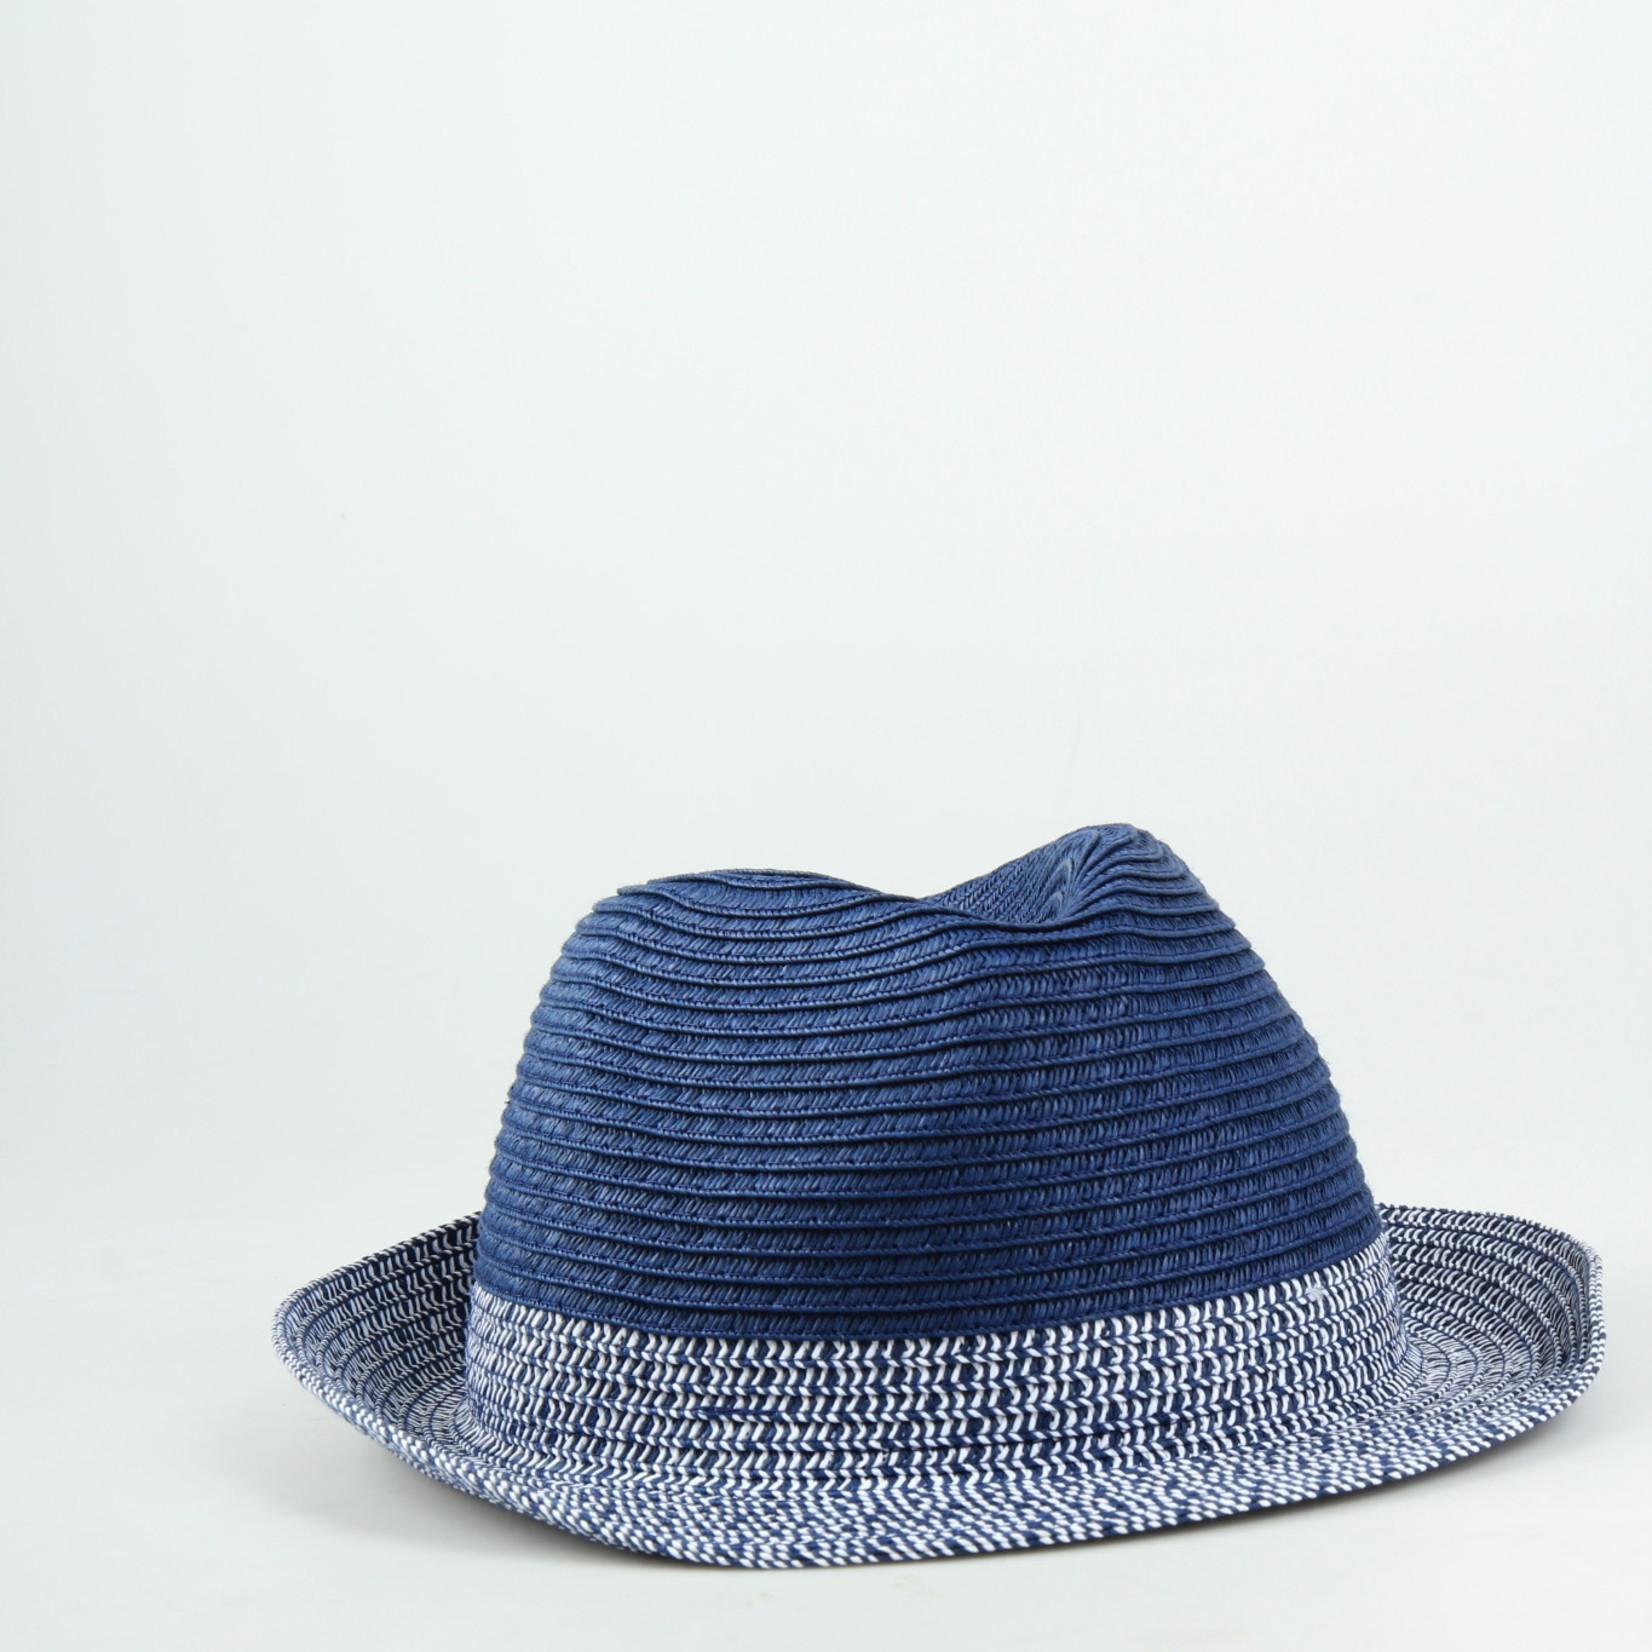 Strohoed Blauw/wit